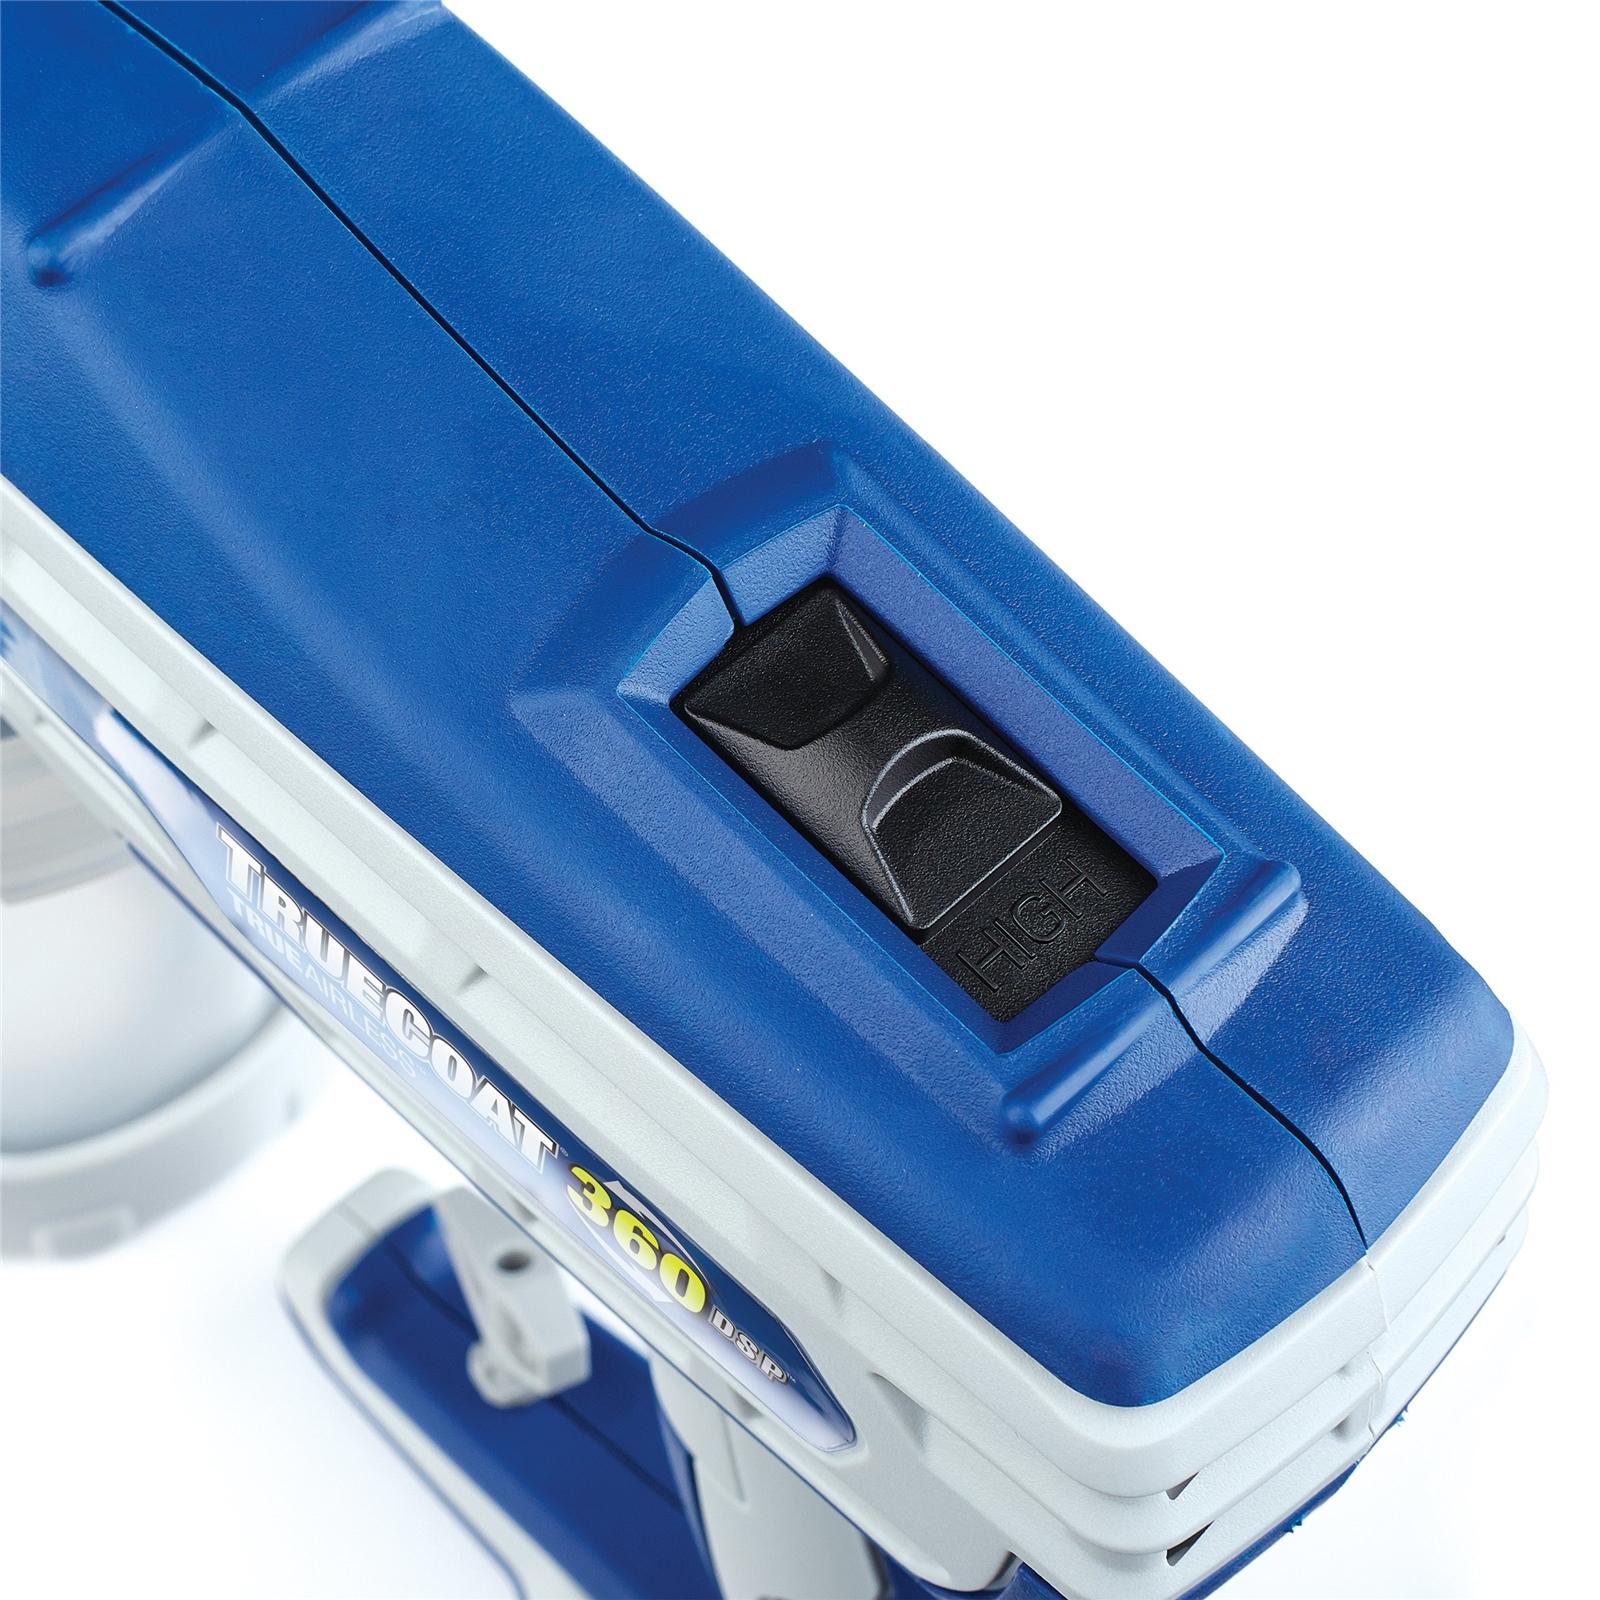 73eecc7915f73 TrueCoat 360 DSP Electric TrueAirless Sprayer